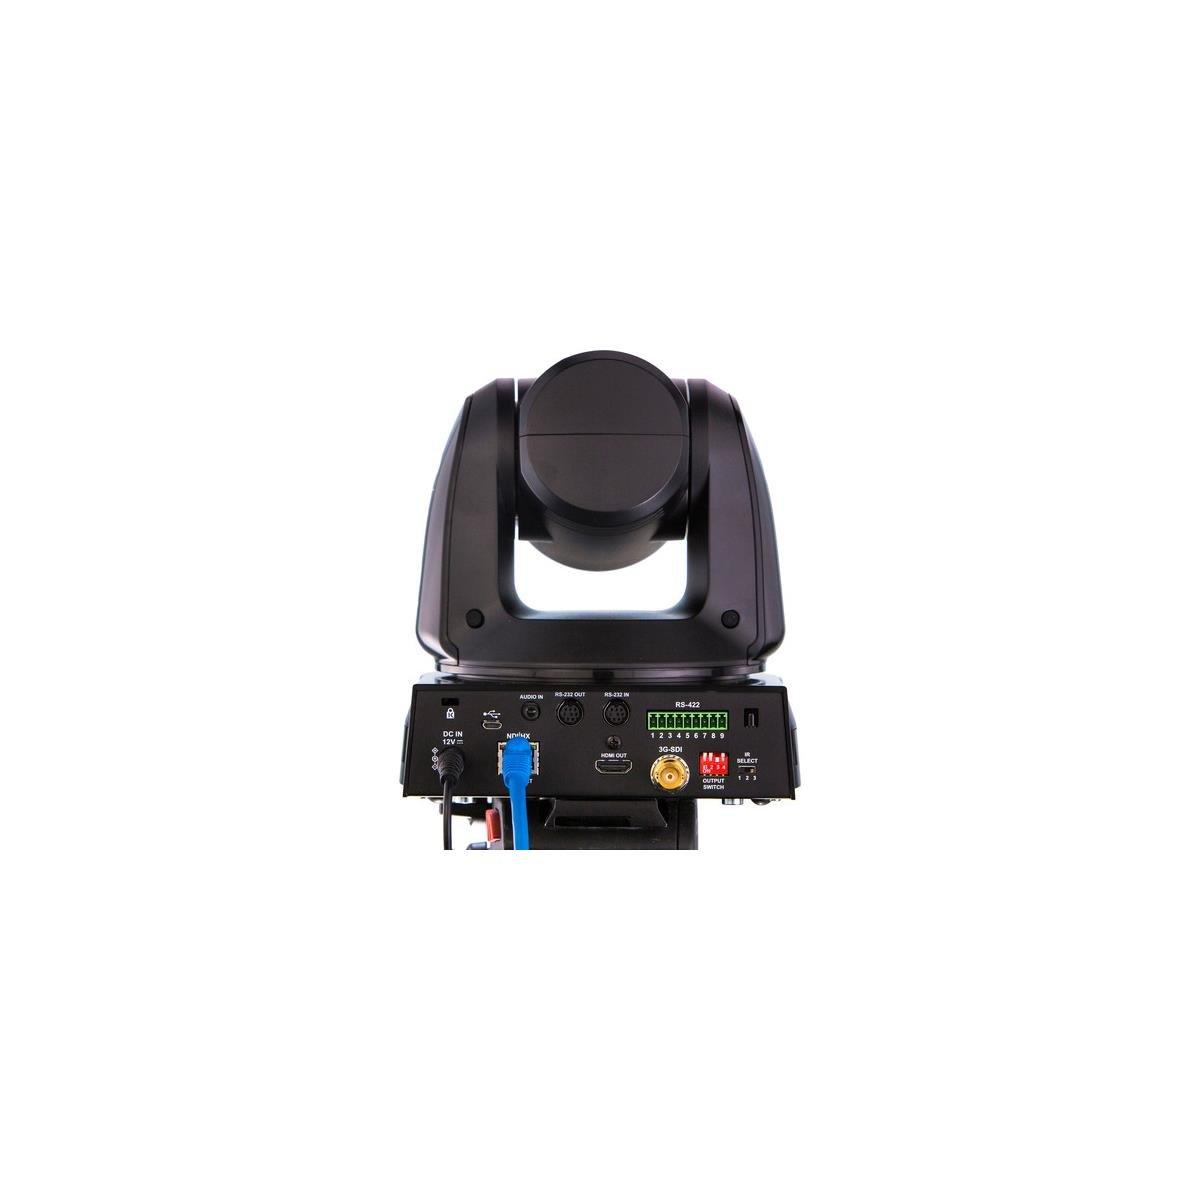 NewTek NDIHX-PTZ1 NDI PTZ Camera - With NewTek Connect Spark HDMI, Cleaning Kit by NewTek (Image #1)